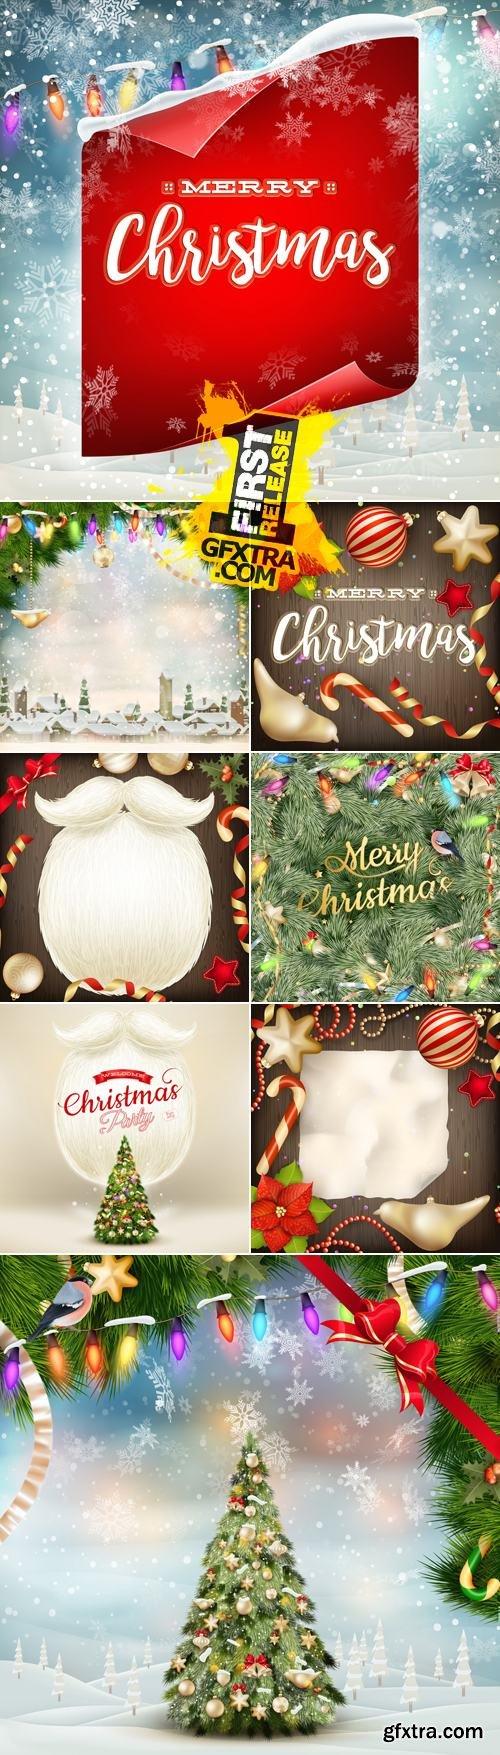 Merry Christmas Cards Vector 8